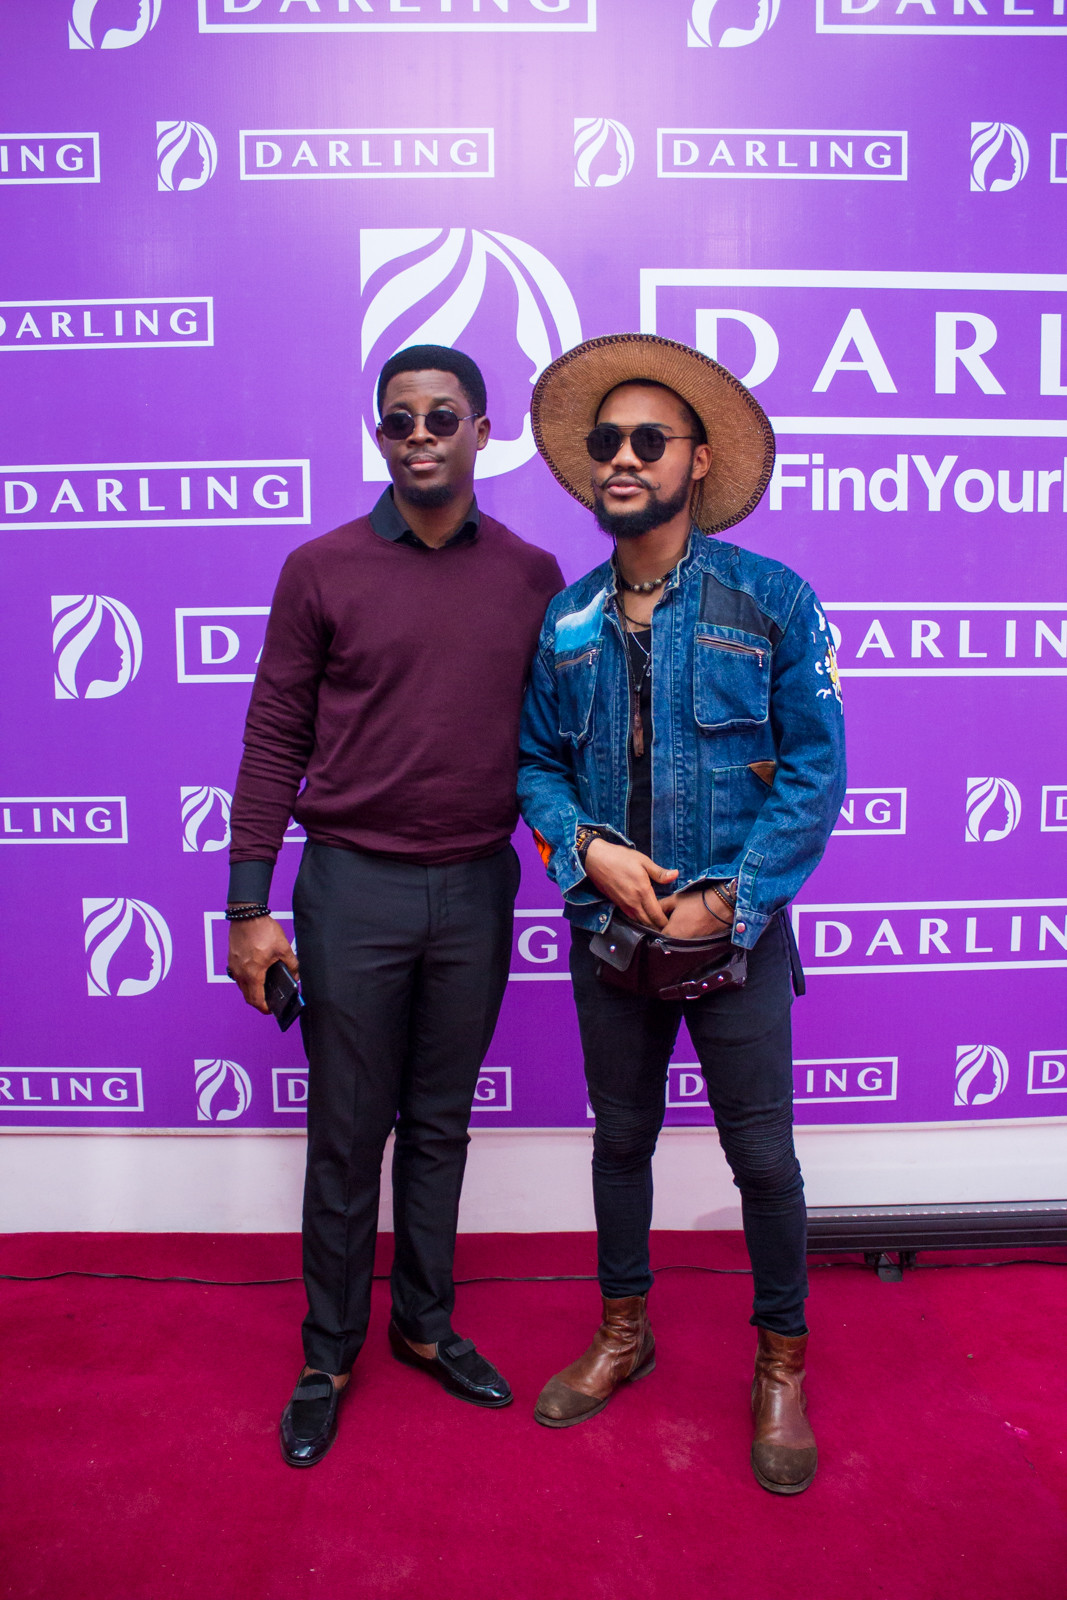 Darling hosts BBNaija housemates; redeems cash prizes for Darling task winners